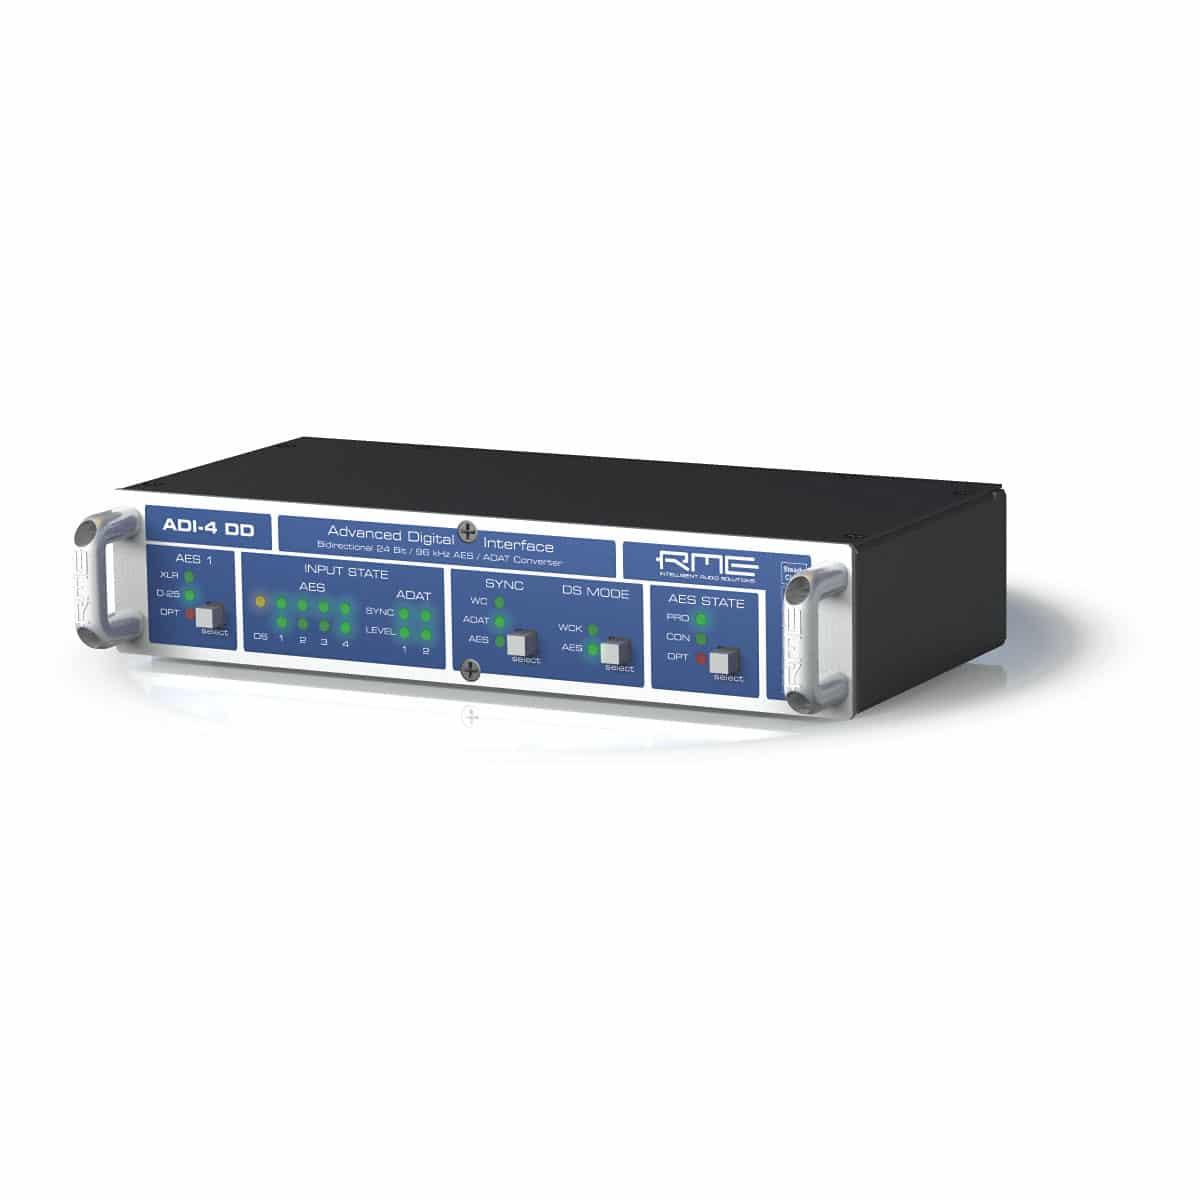 RME ADI 4 DD 01 Convertitori Audio, Pro Audio, Audio Digitale